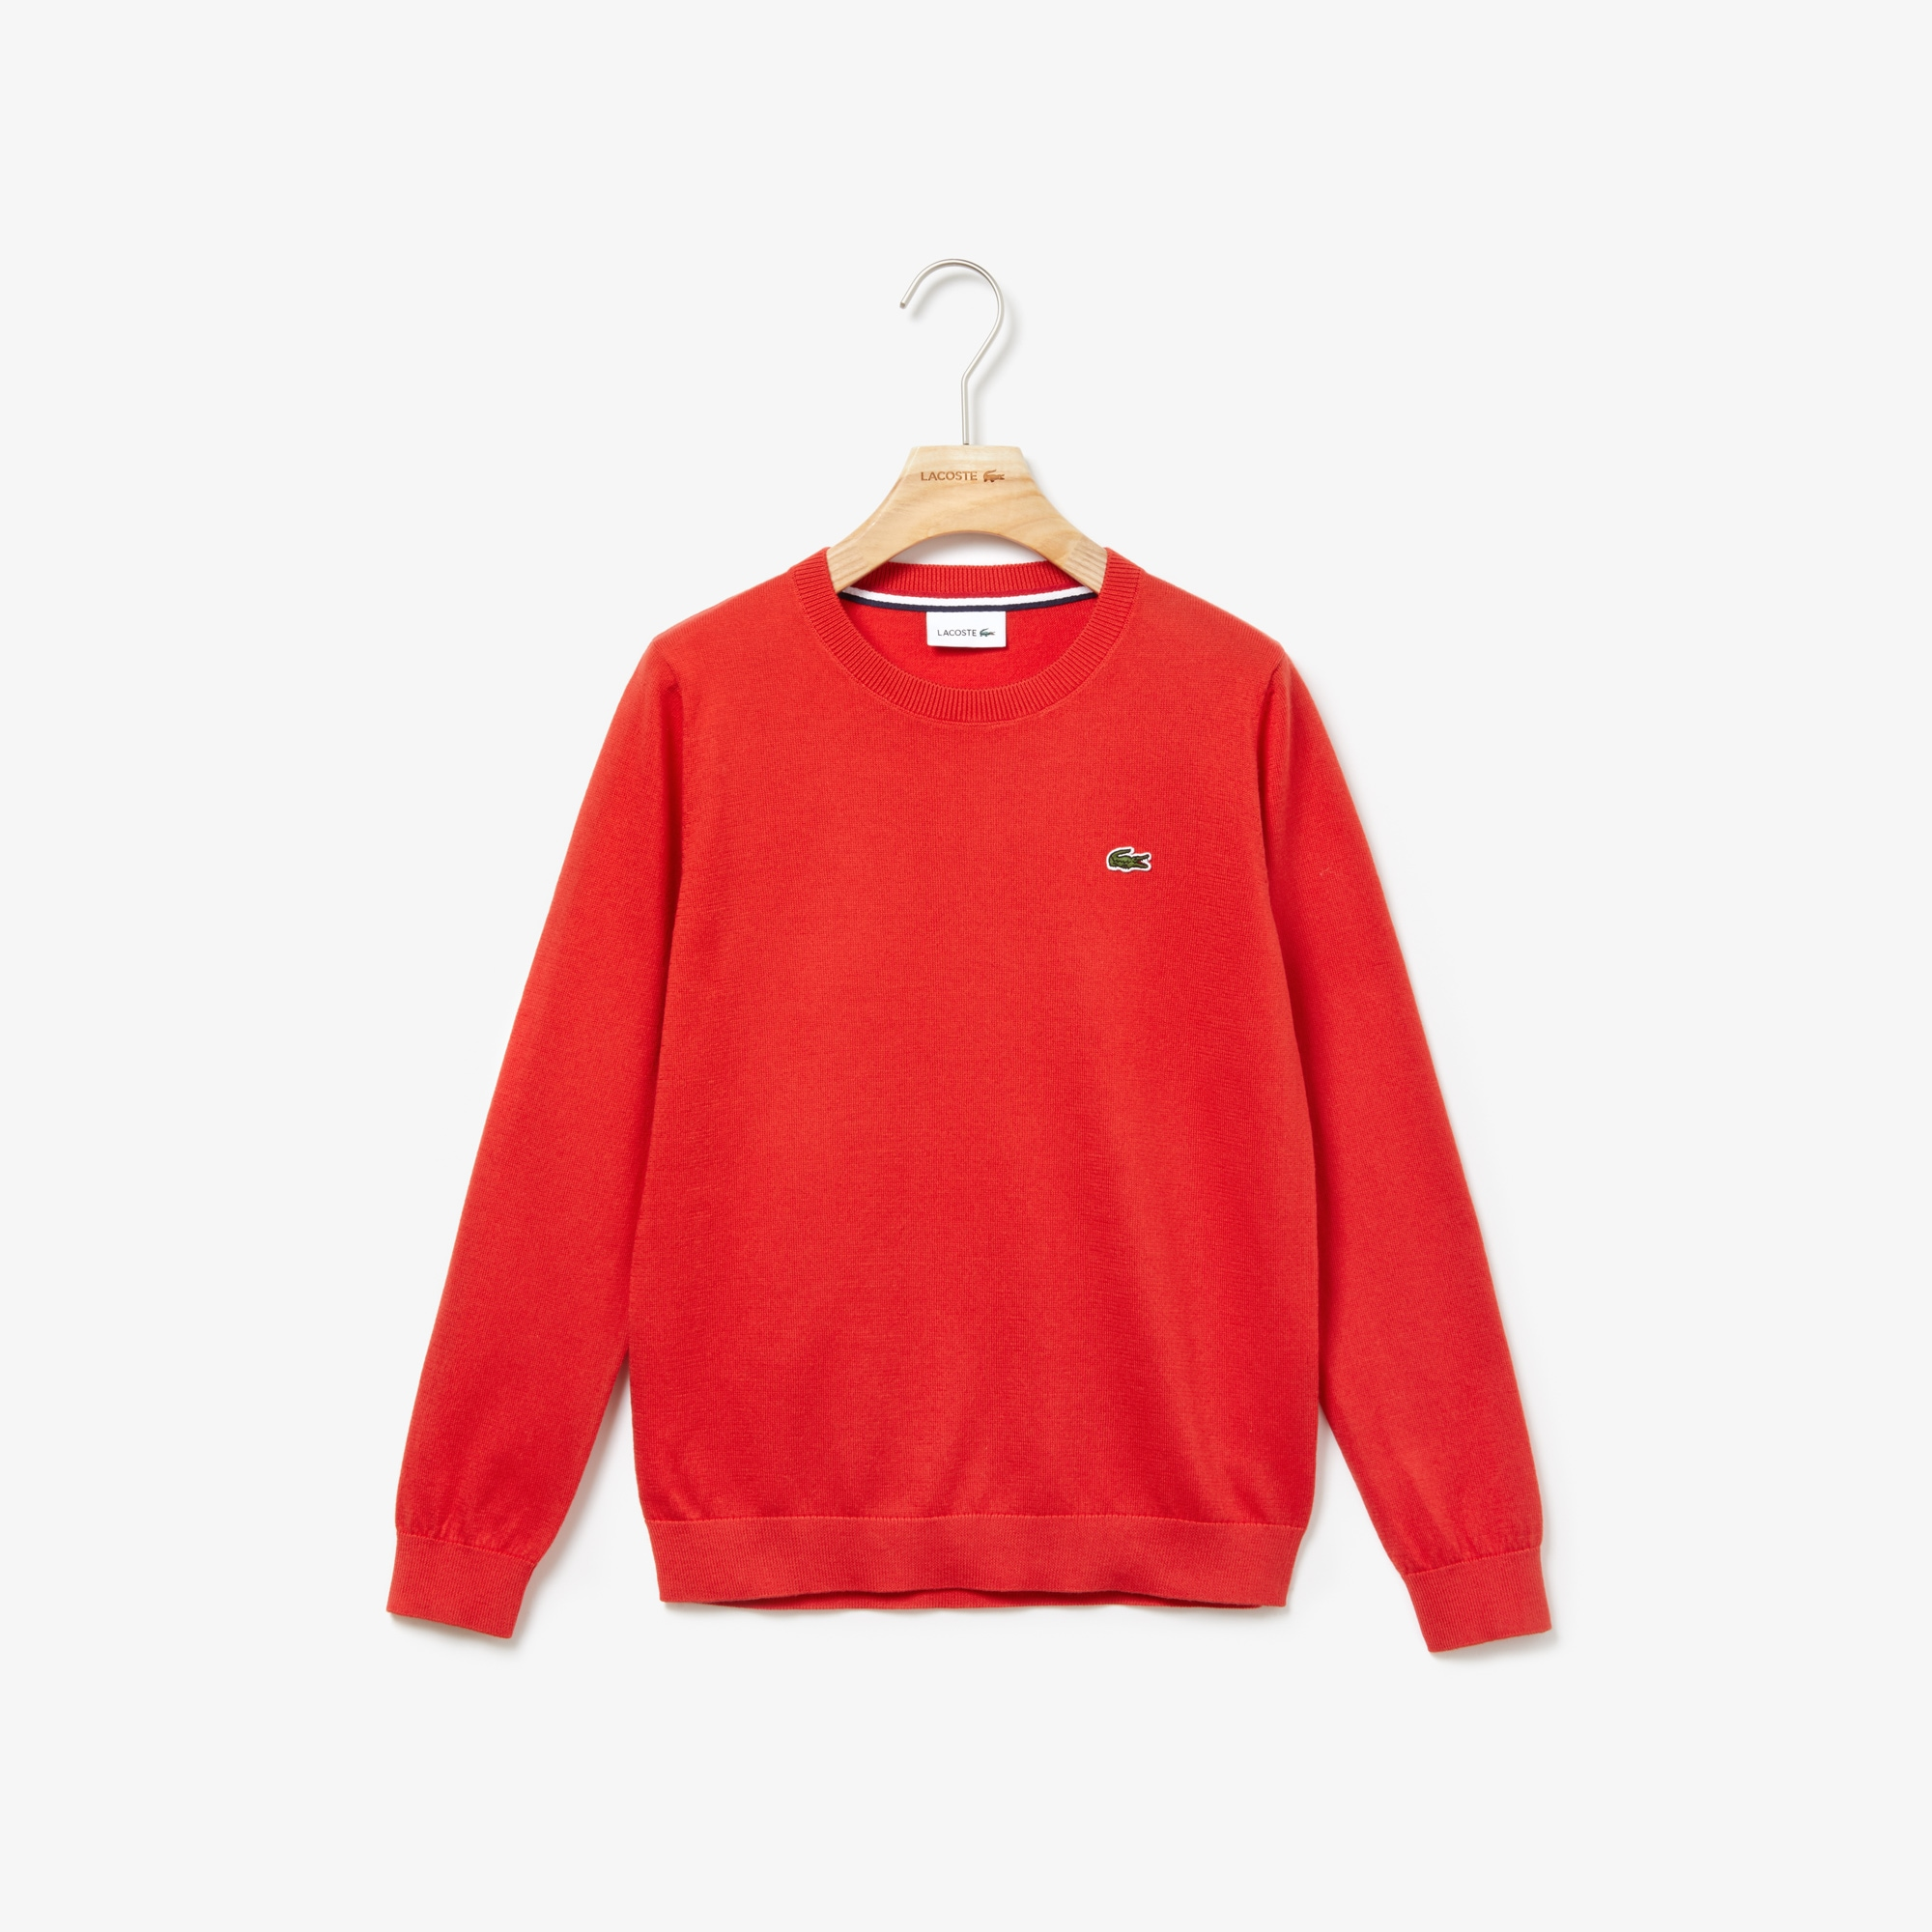 Boys' Crew Neck Cotton Jersey Sweater